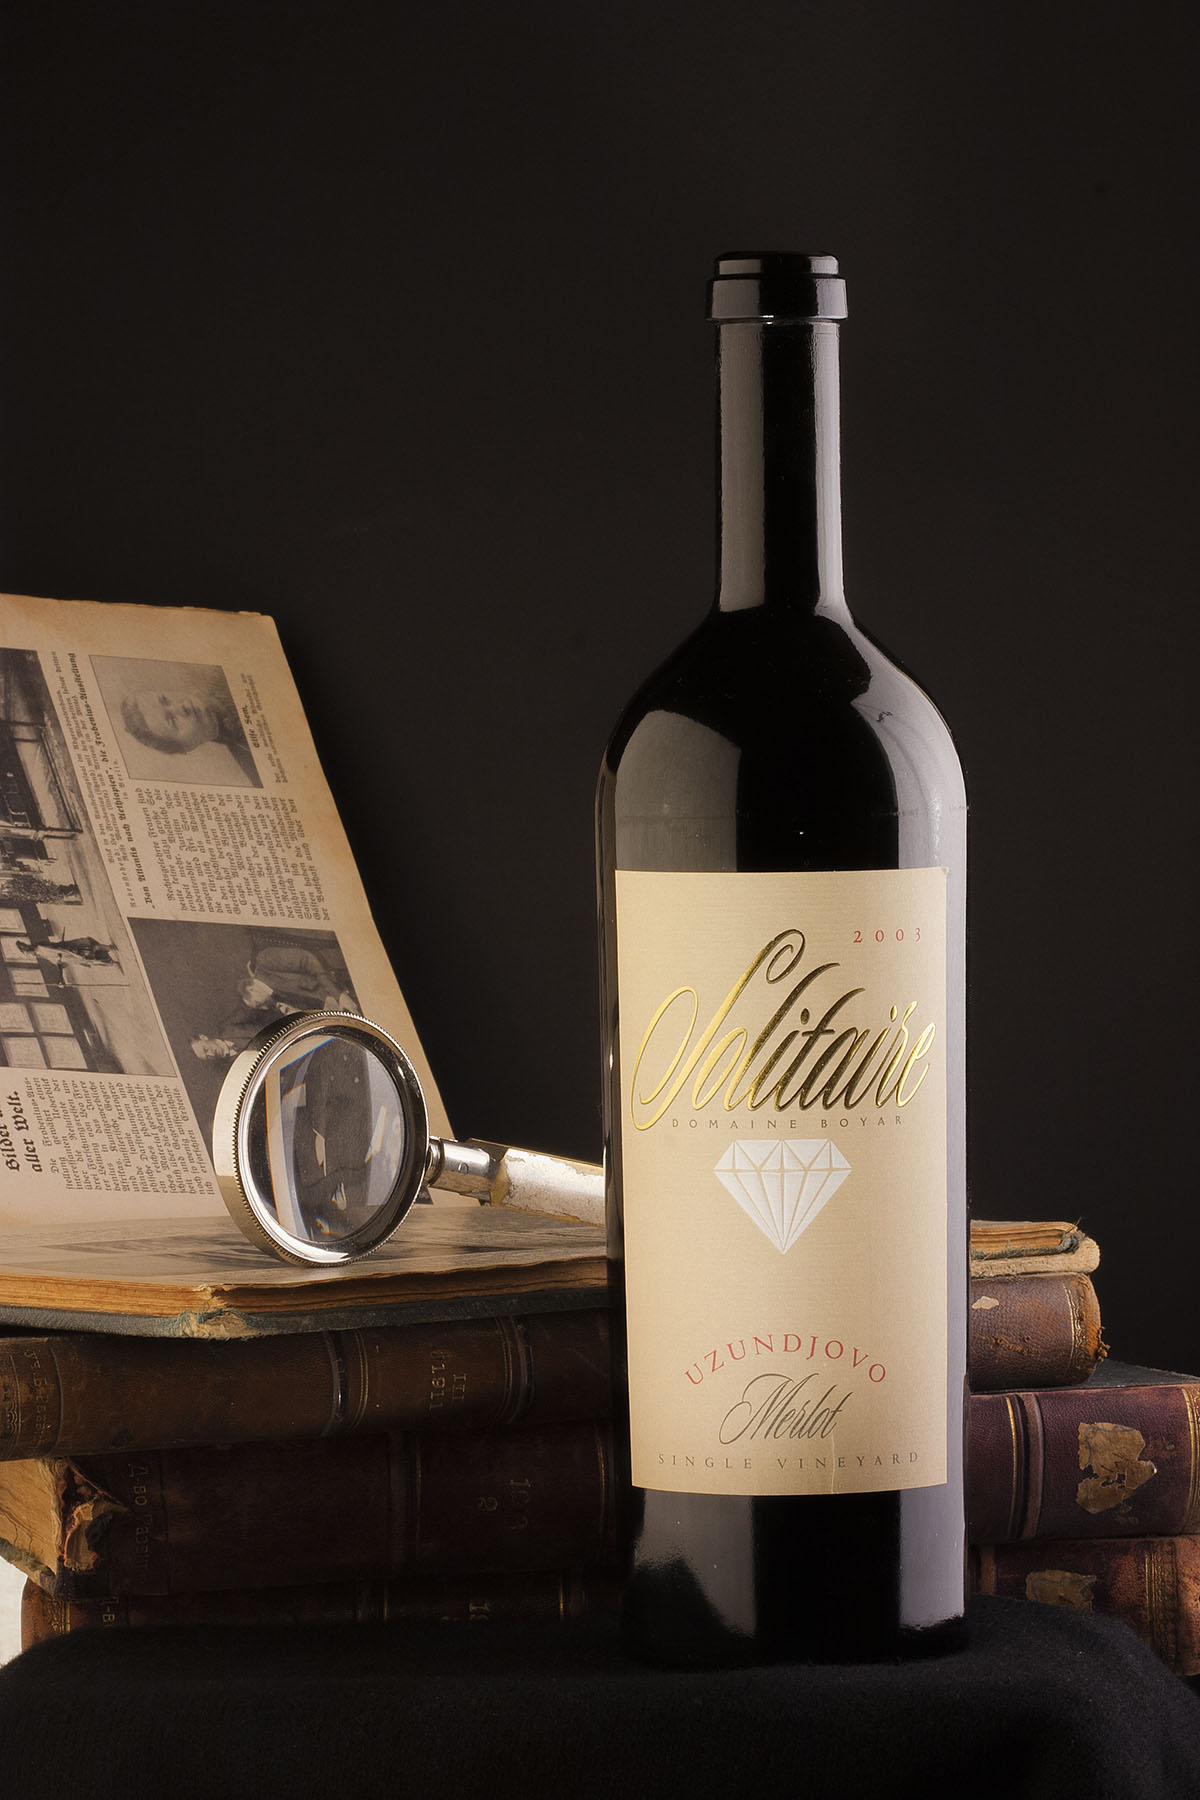 Solitaire wine label